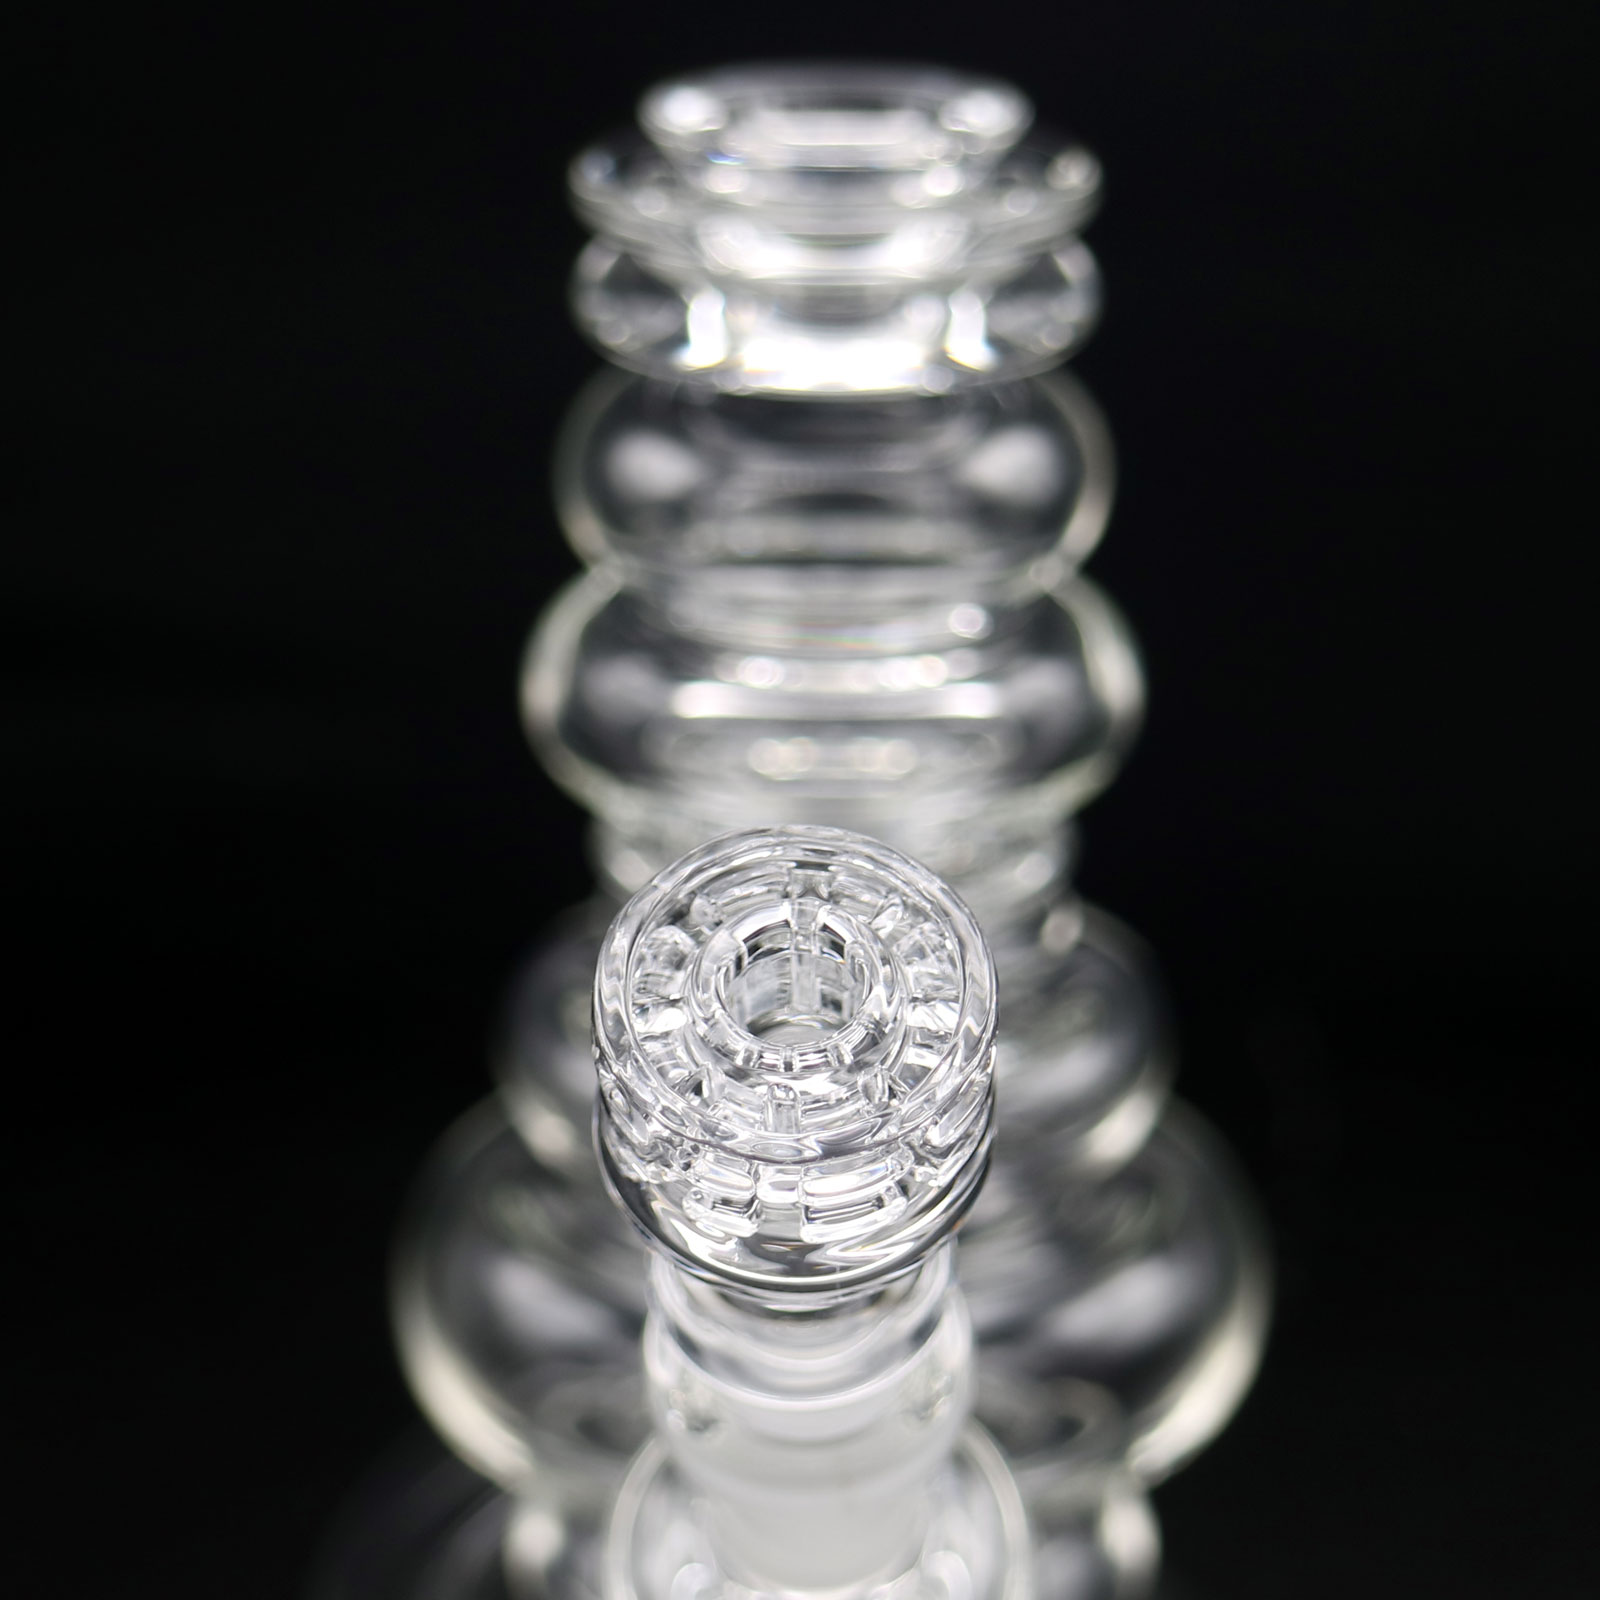 Jred Glass – 10 mm Male Diamond Knot